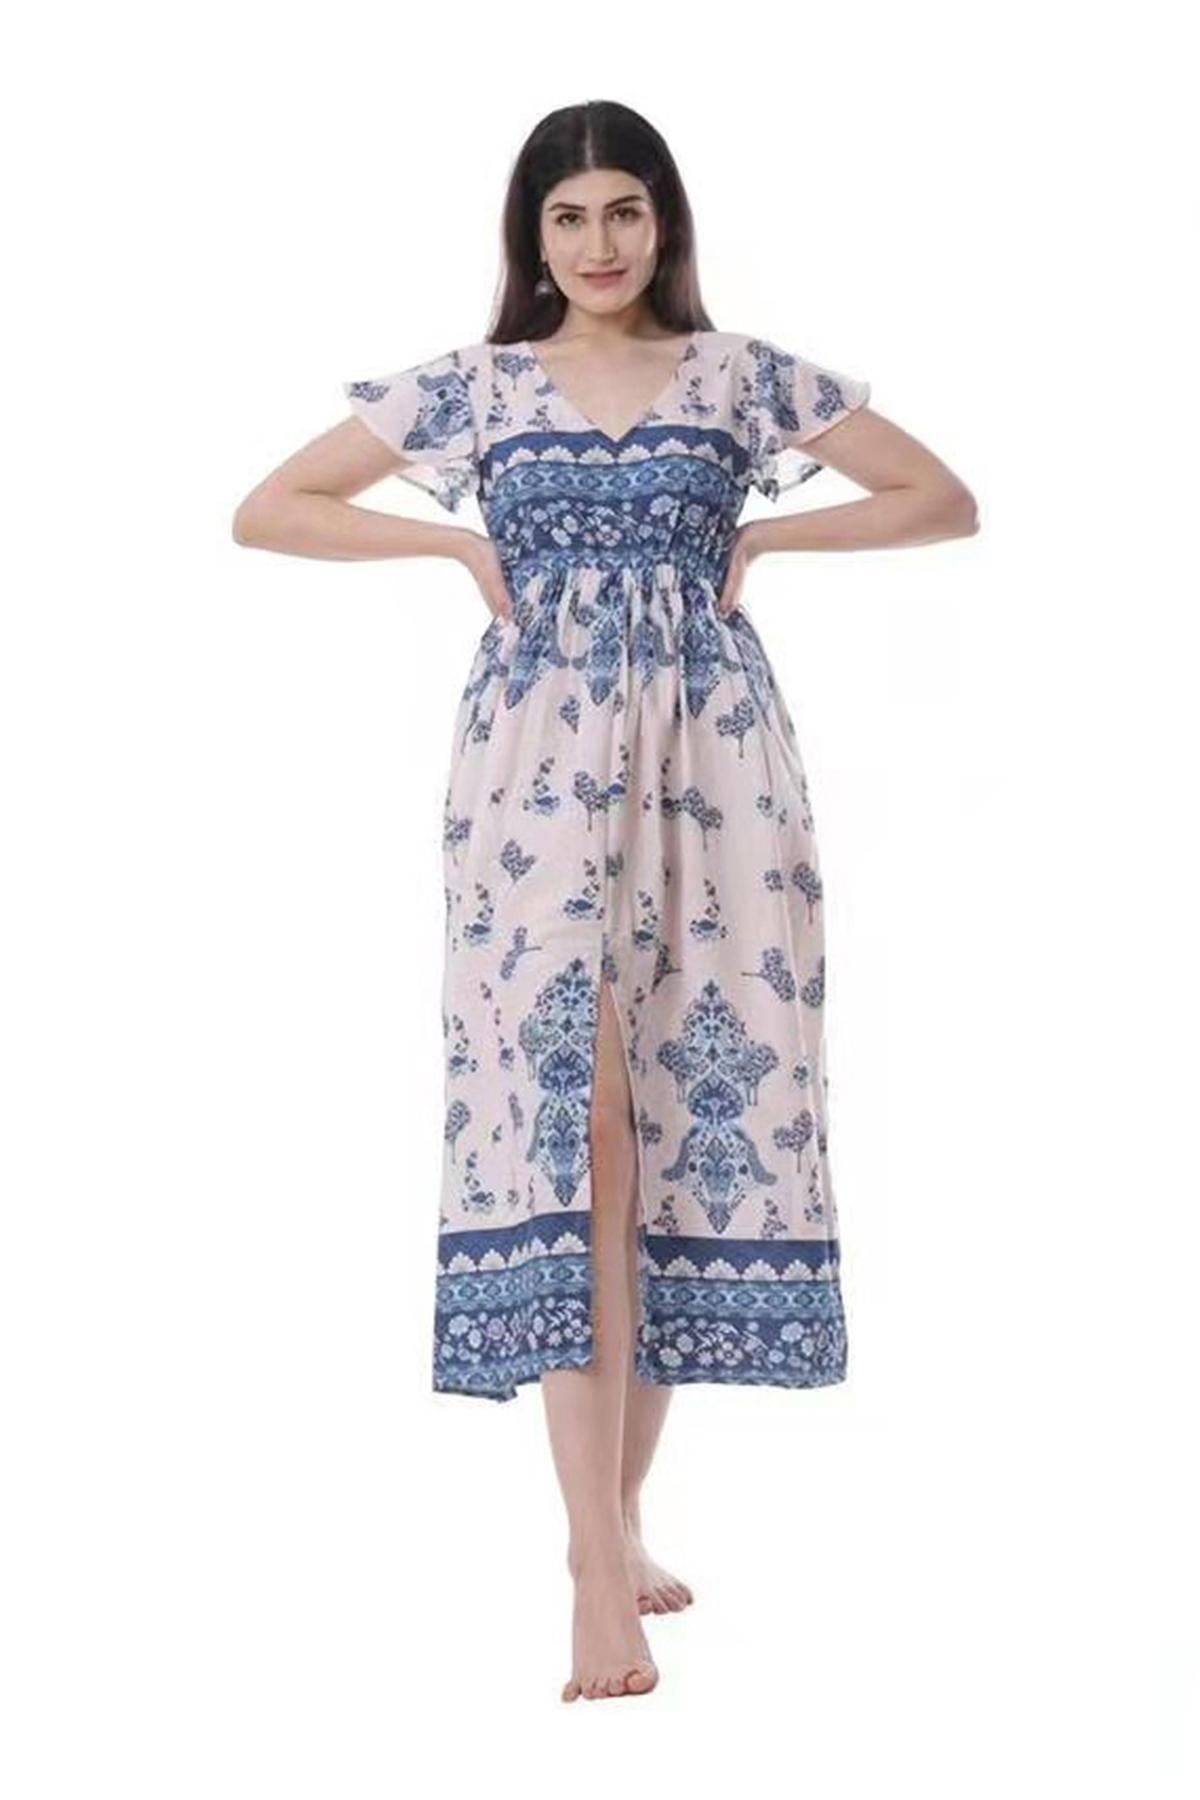 Robes mi-longues Femme Jean SARL LIFA  IN06103 #c eFashion Paris